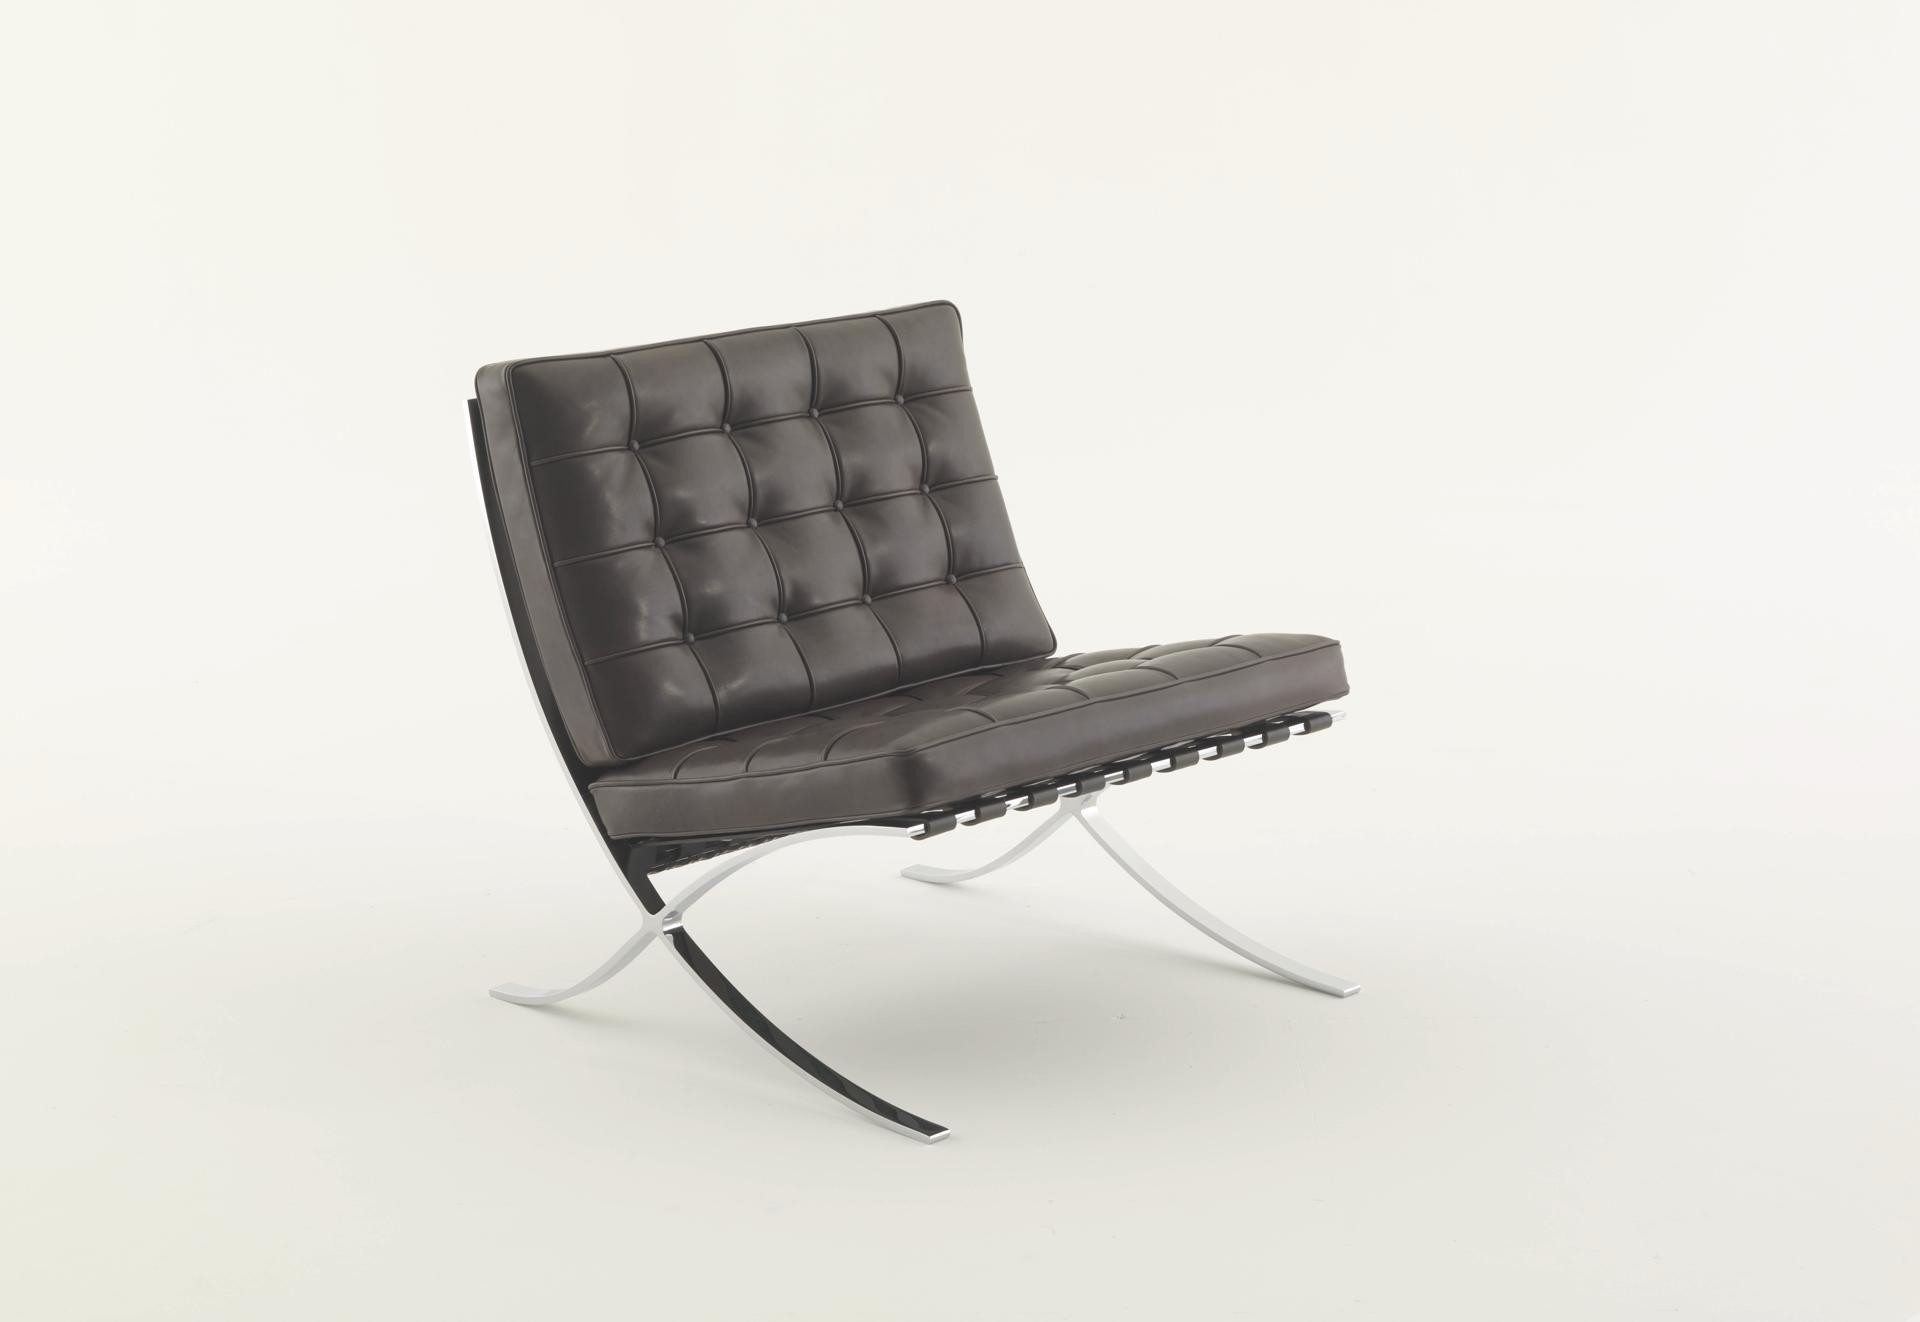 Barcelona Chair Dimensions | HomesFeed